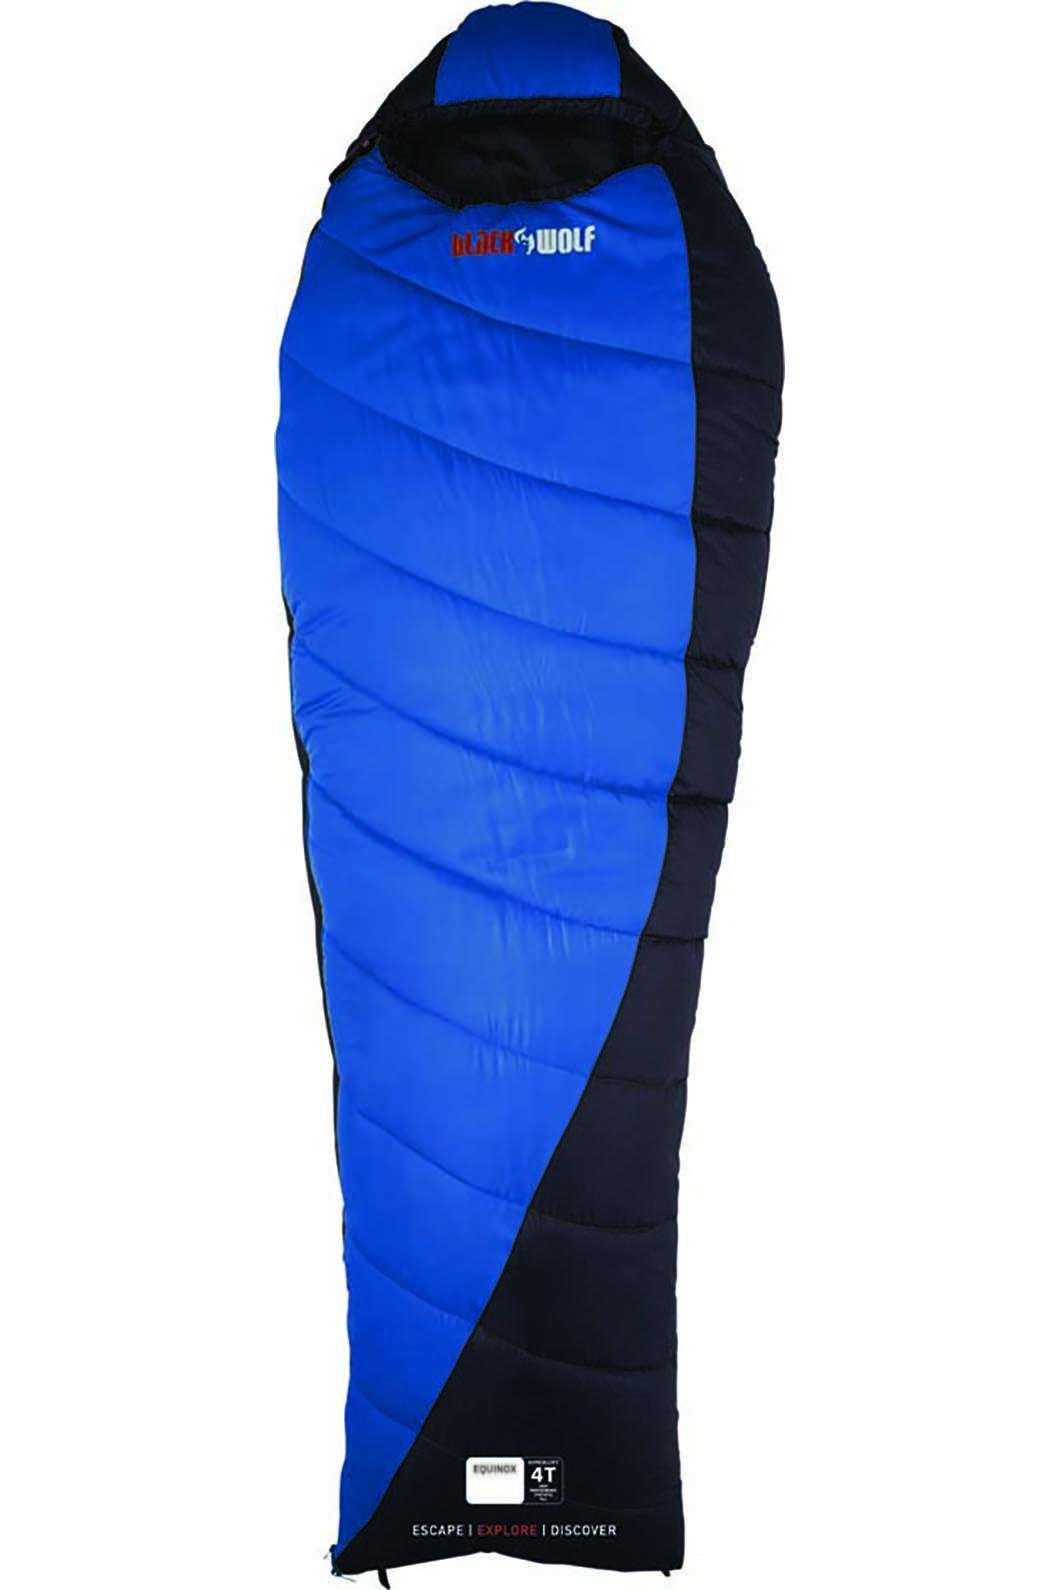 BlackWolf Equinox 220 Sleeping Bag, None, hi-res